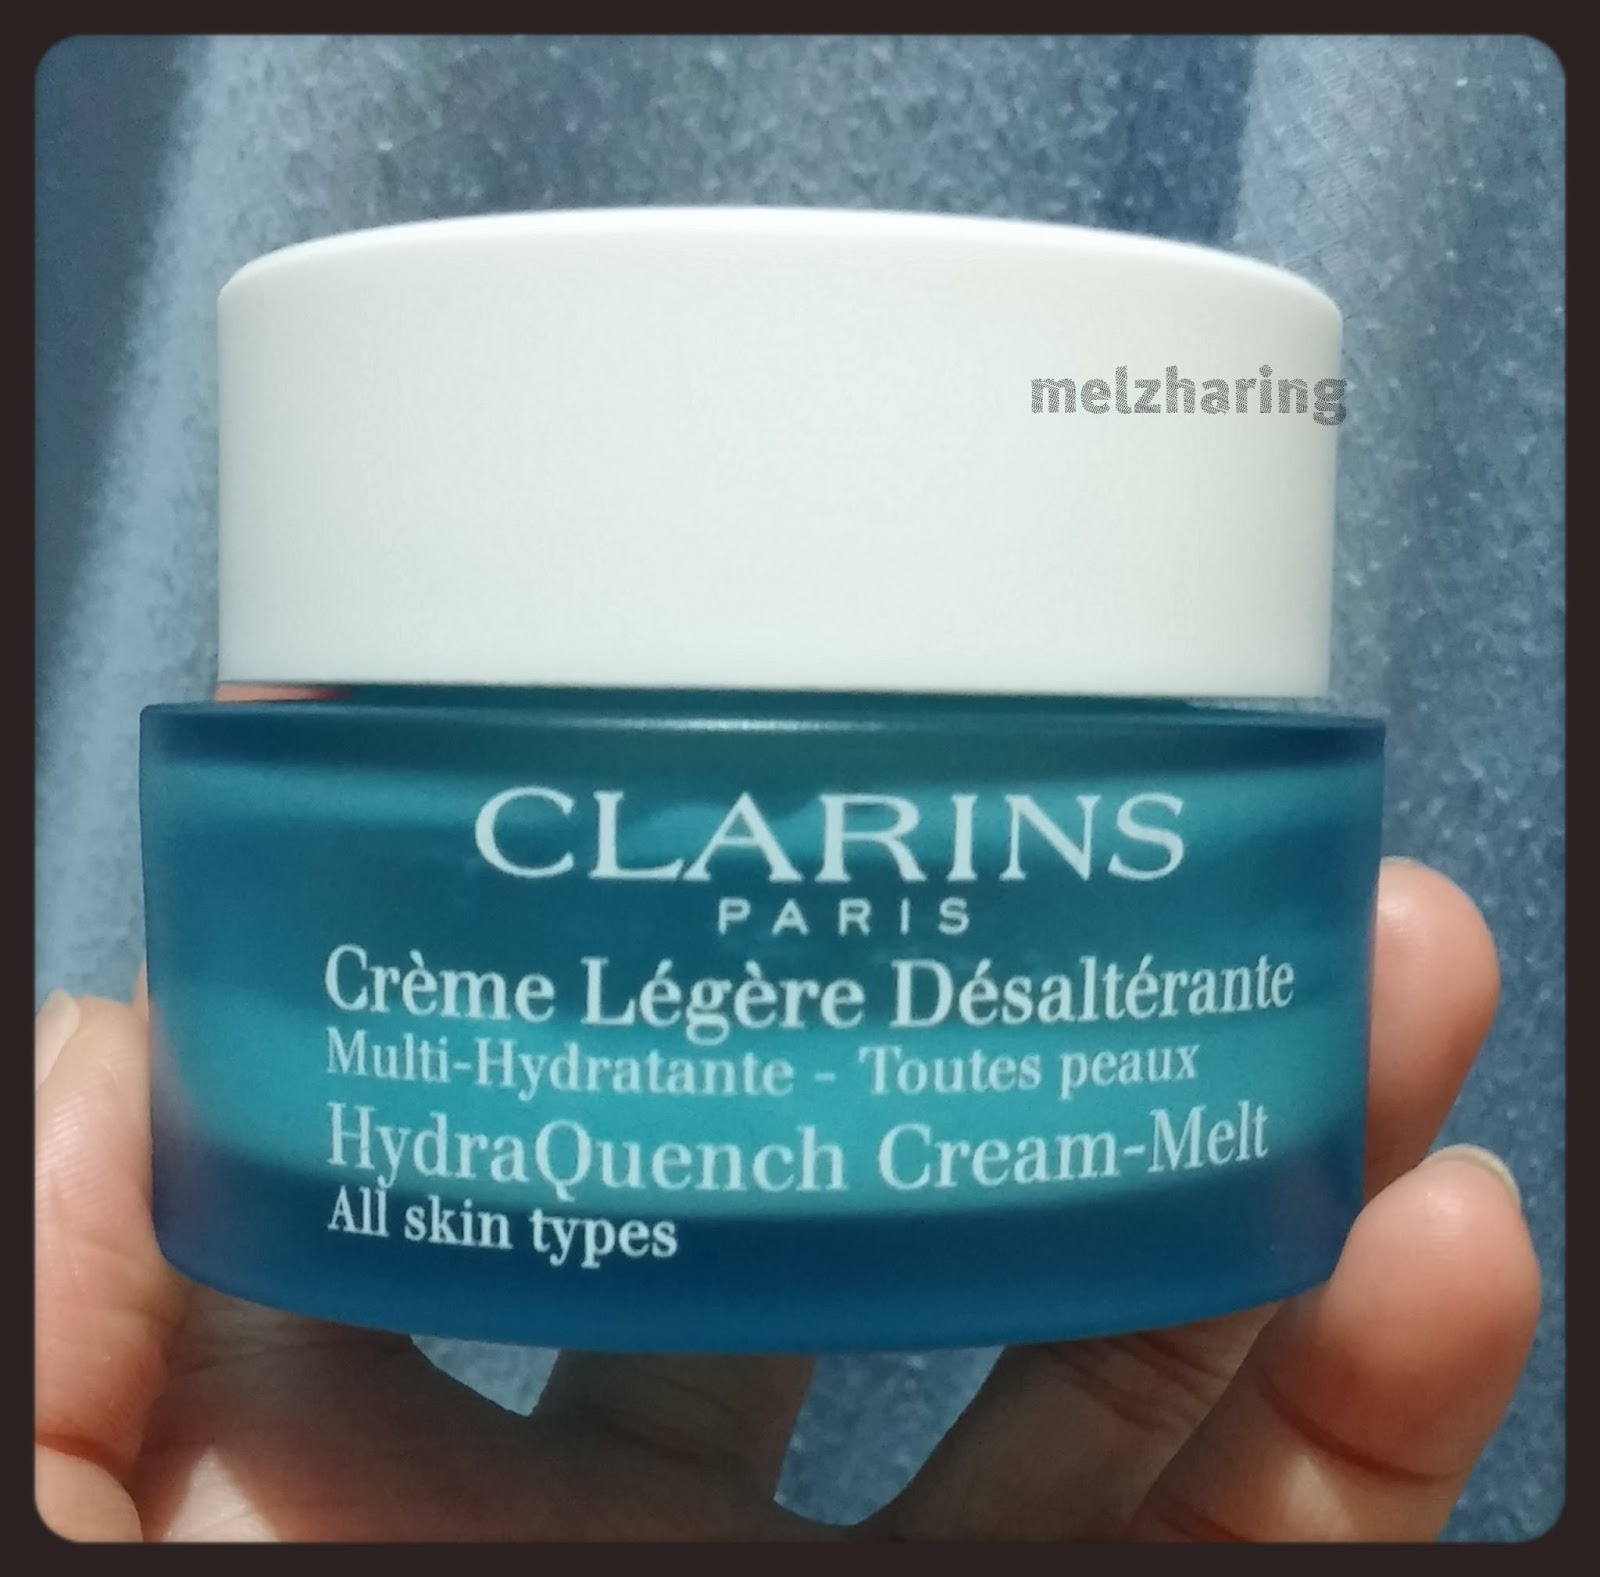 Clarins Hydraquench Cream Melt 15 Ml Update Daftar Harga Terbaru Gel Normal To Combination Skin 15ml All Types